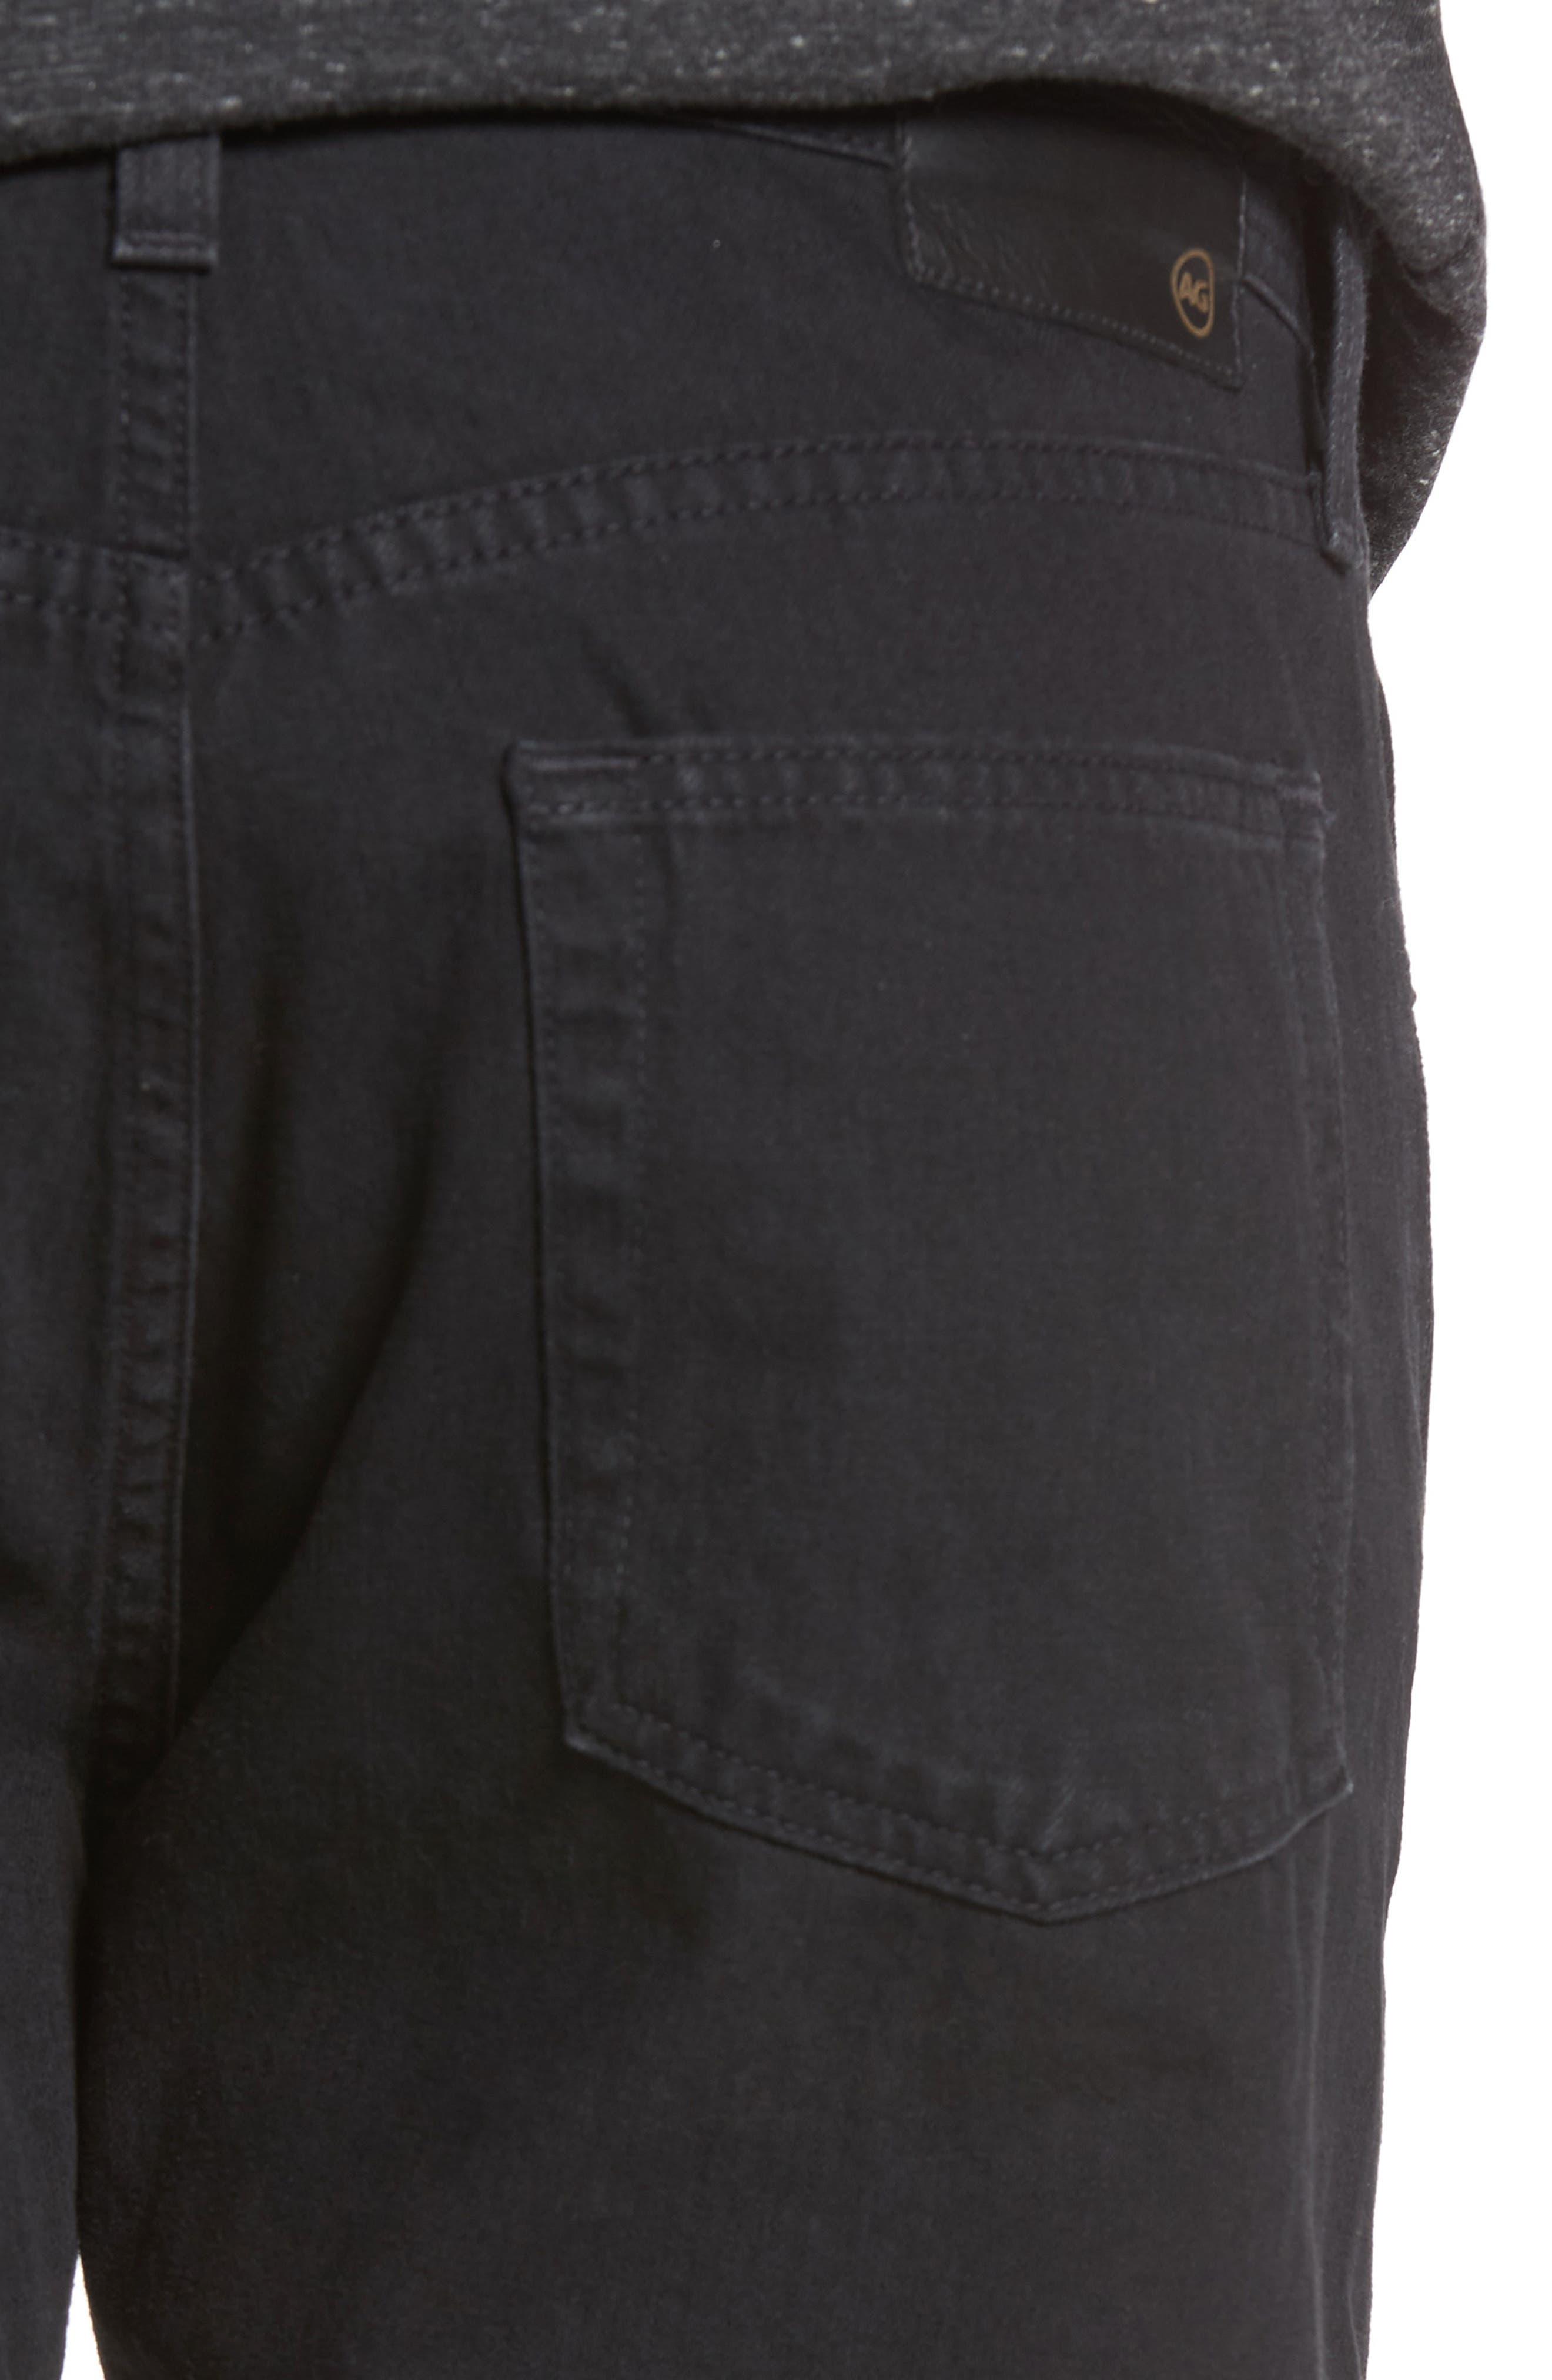 Apex Slouchy Slim Fit Jeans,                             Alternate thumbnail 4, color,